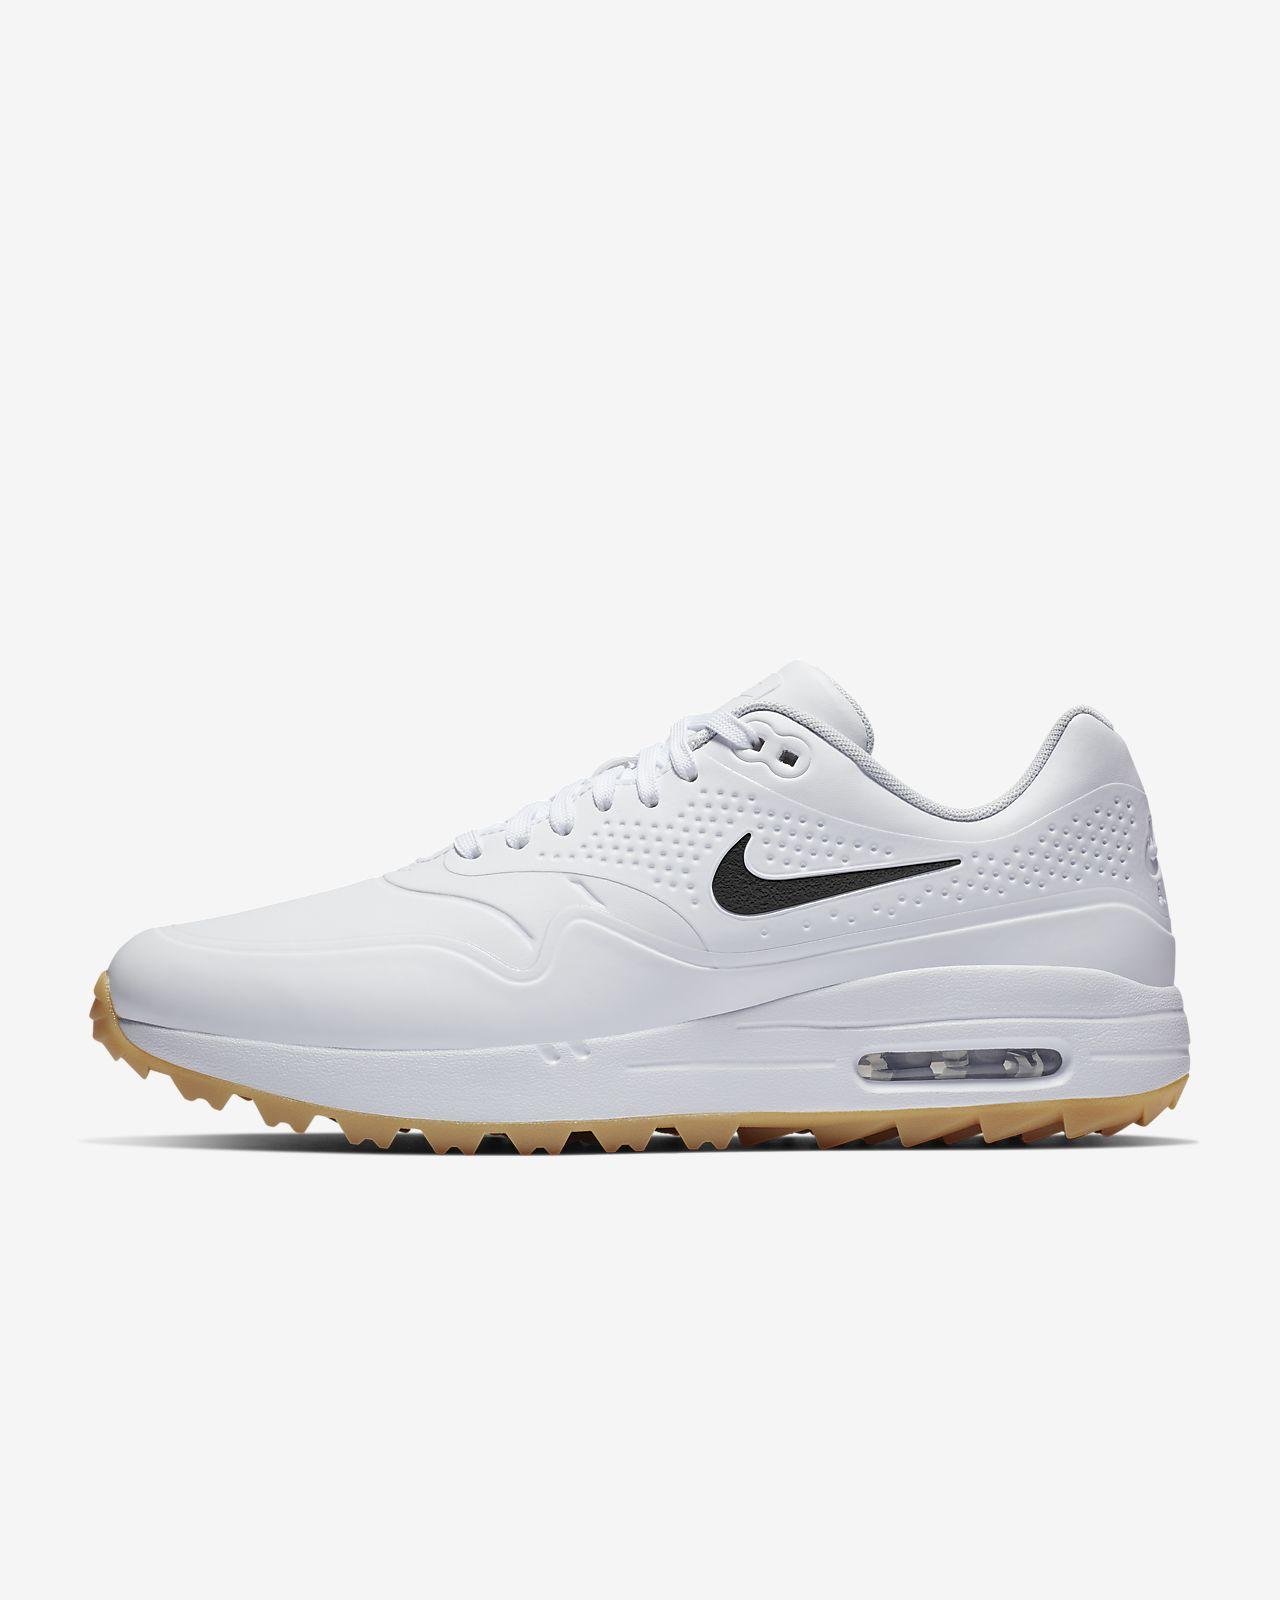 sports shoes 46c26 095a7 ... Chaussure de golf Nike Air Max 1 G pour Homme